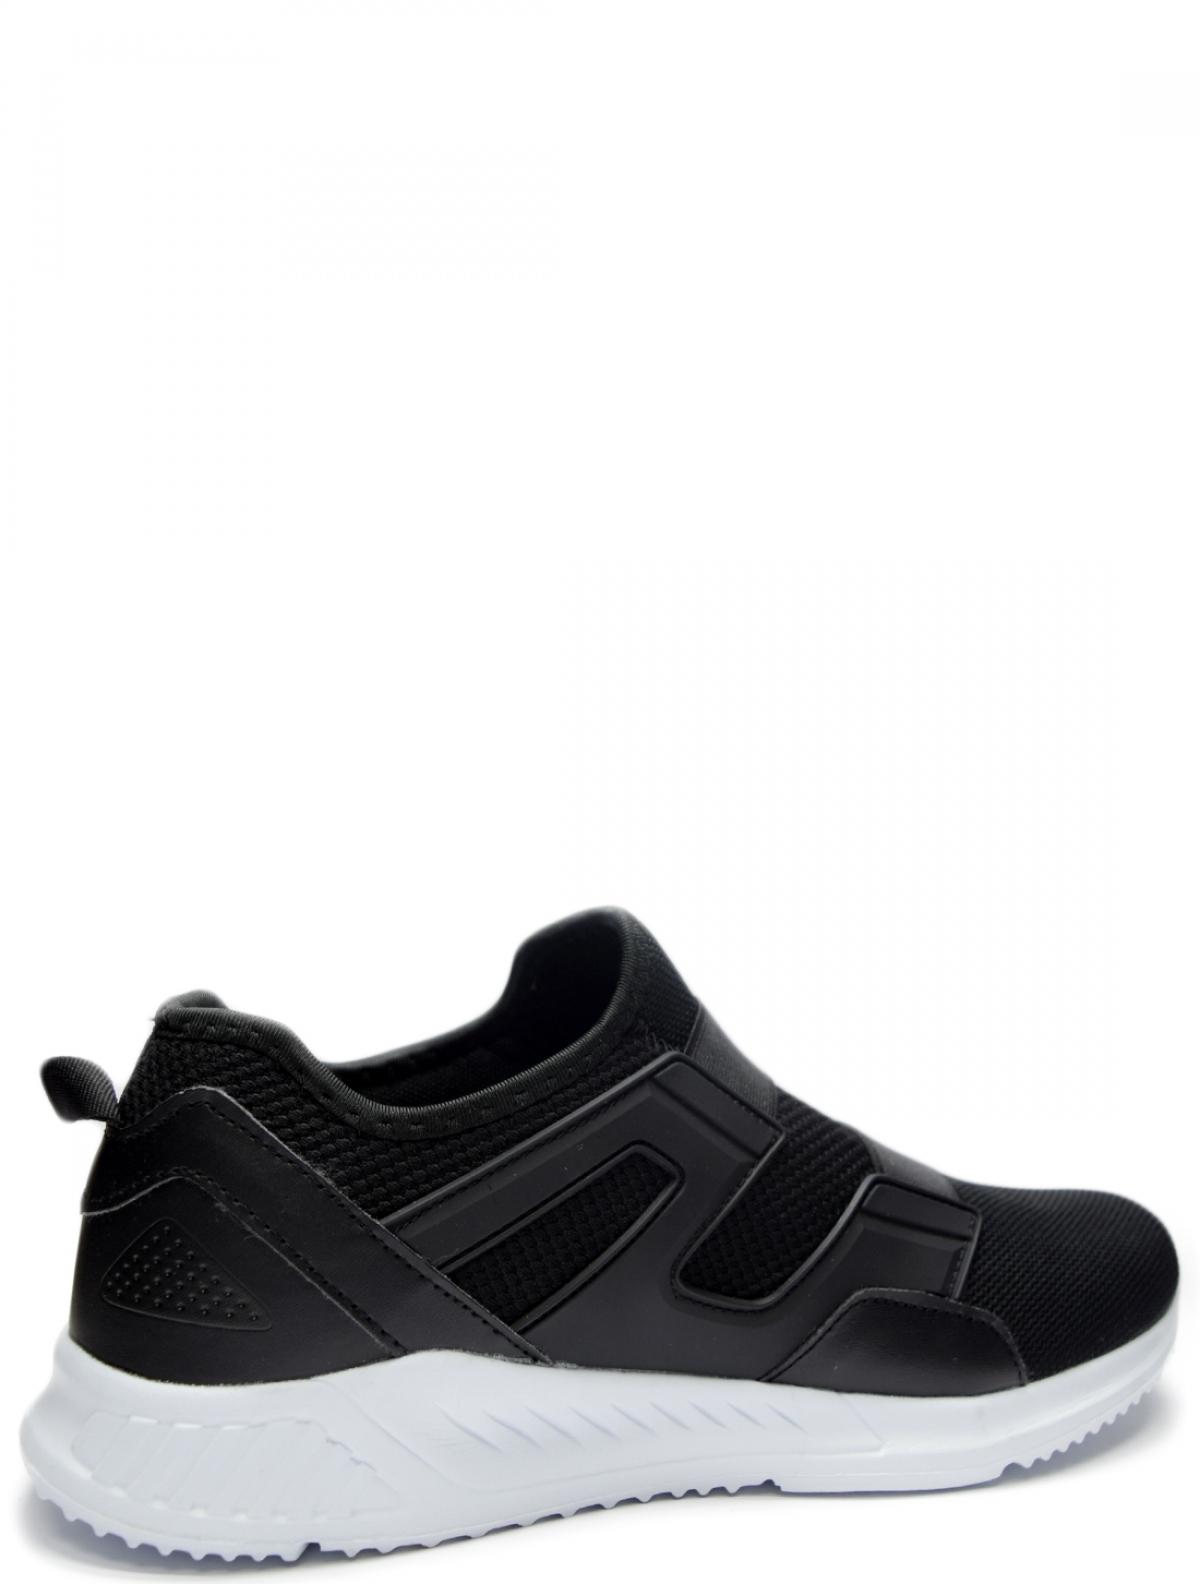 Trien JM-9225-1 мужские кроссовки